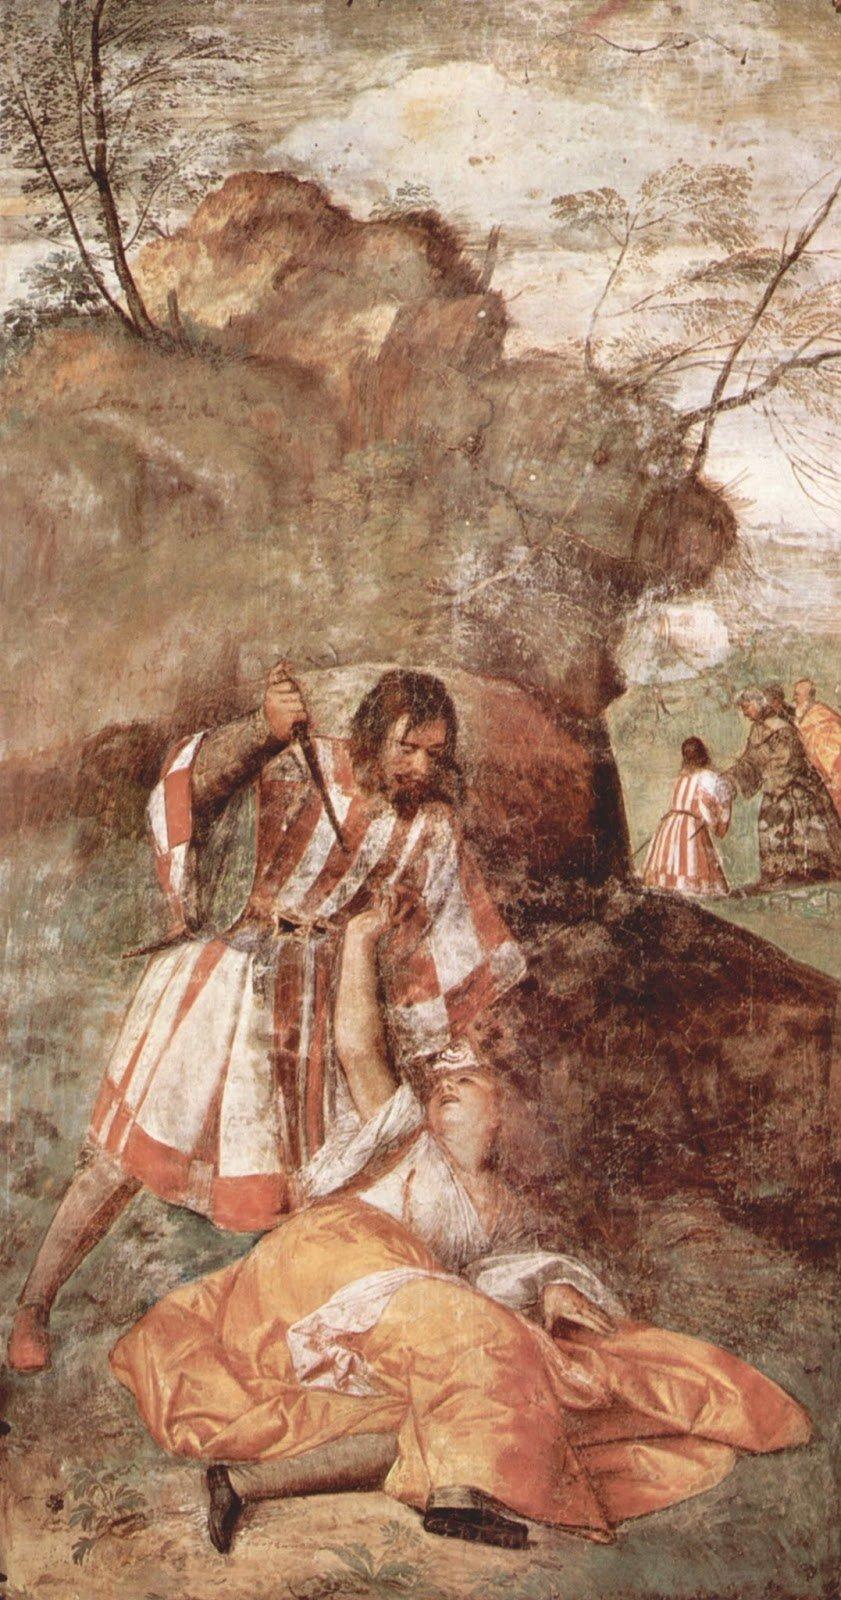 The Jealous Husband by Titian, 340cm _ 207 cm, Fresco, 1510 - Scuola di Sant'Antonio, Padua